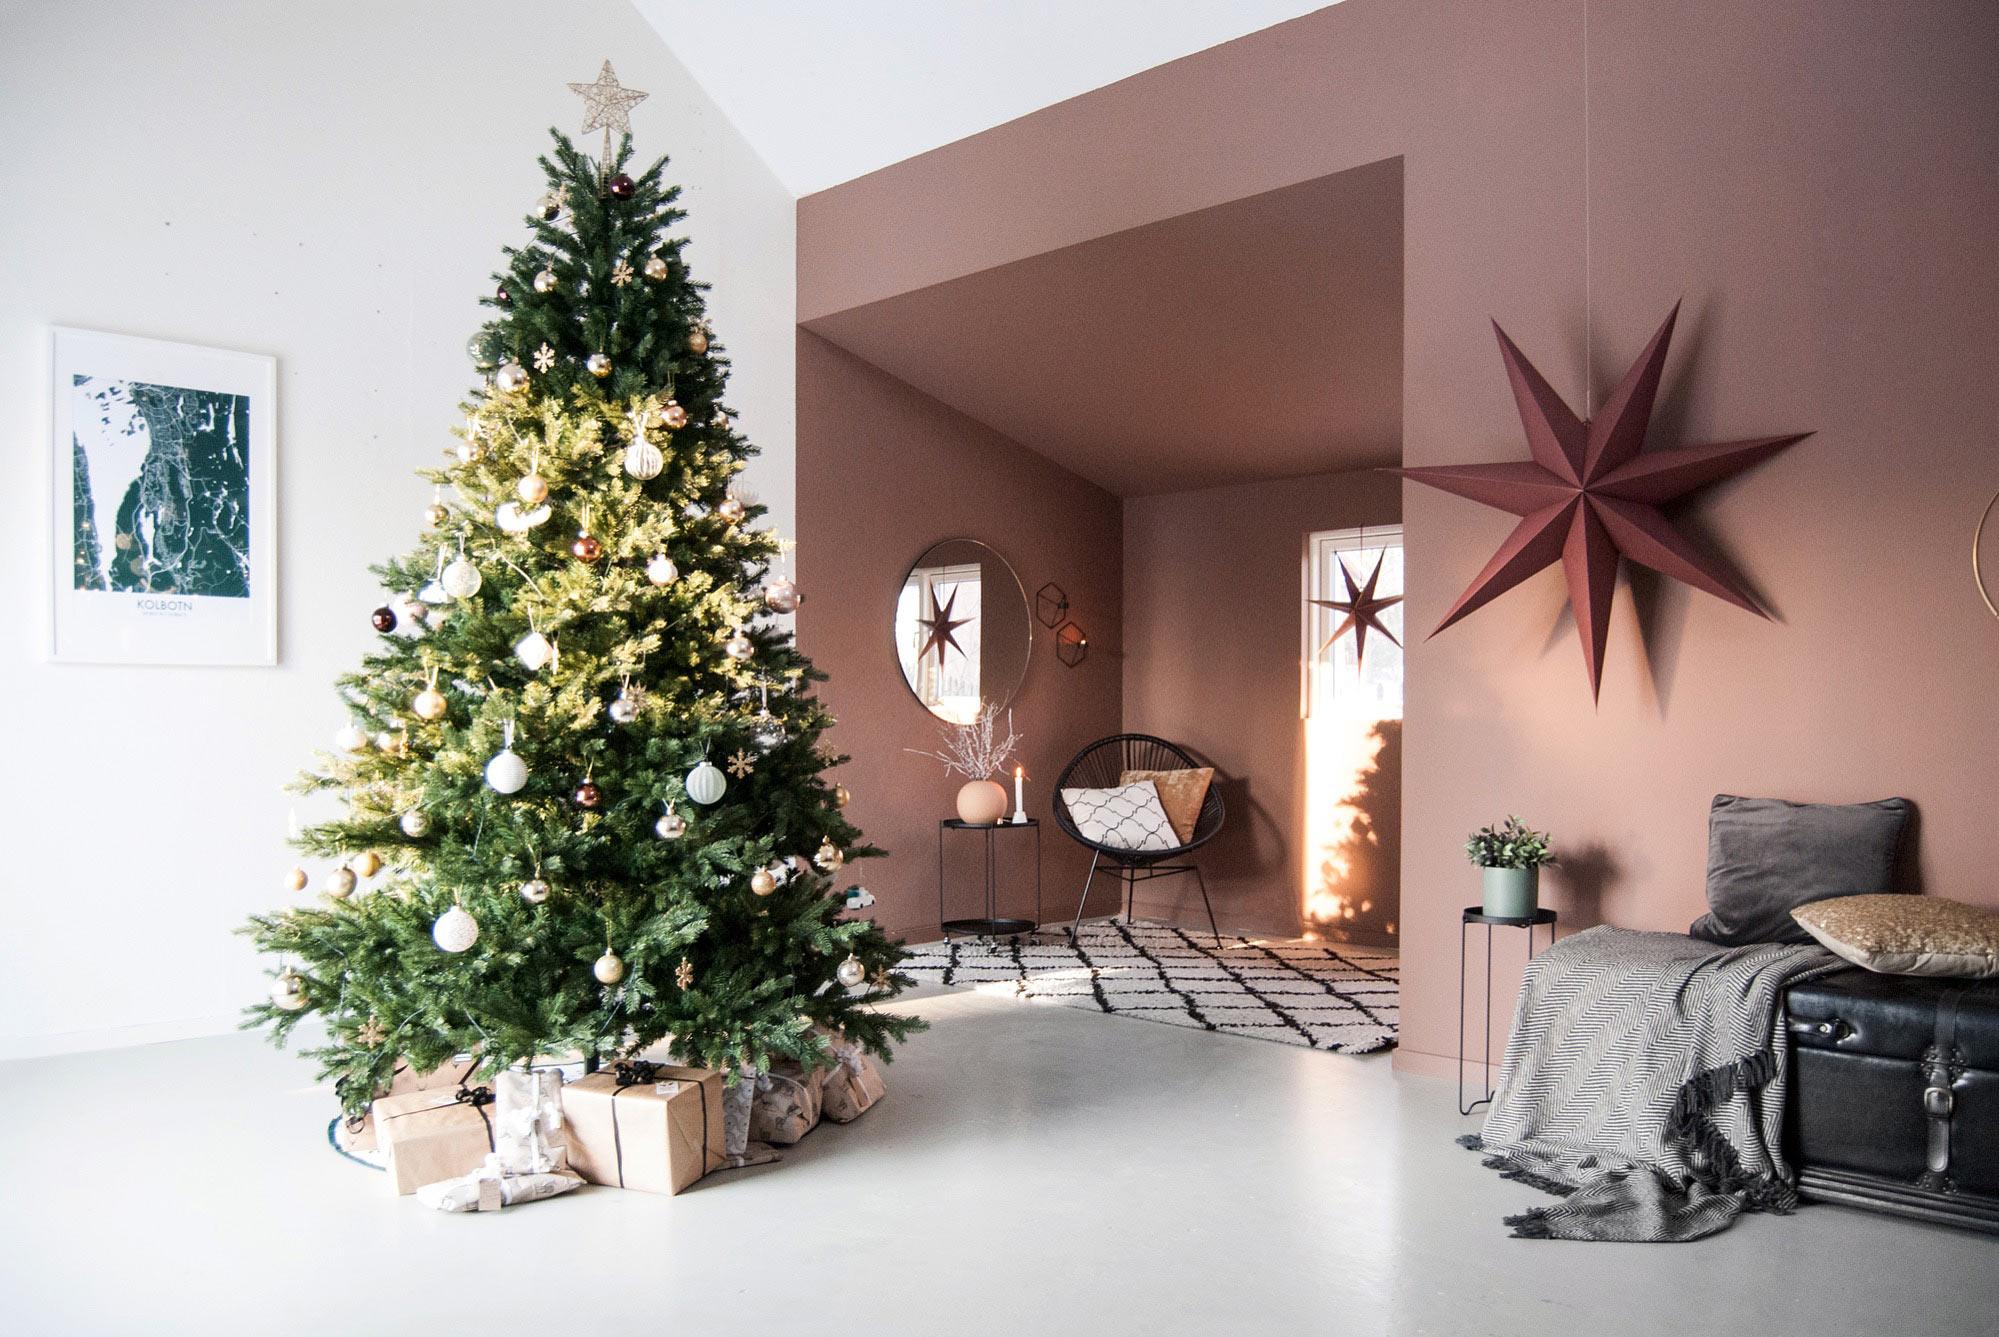 Jul i varma färger hos Vibeke